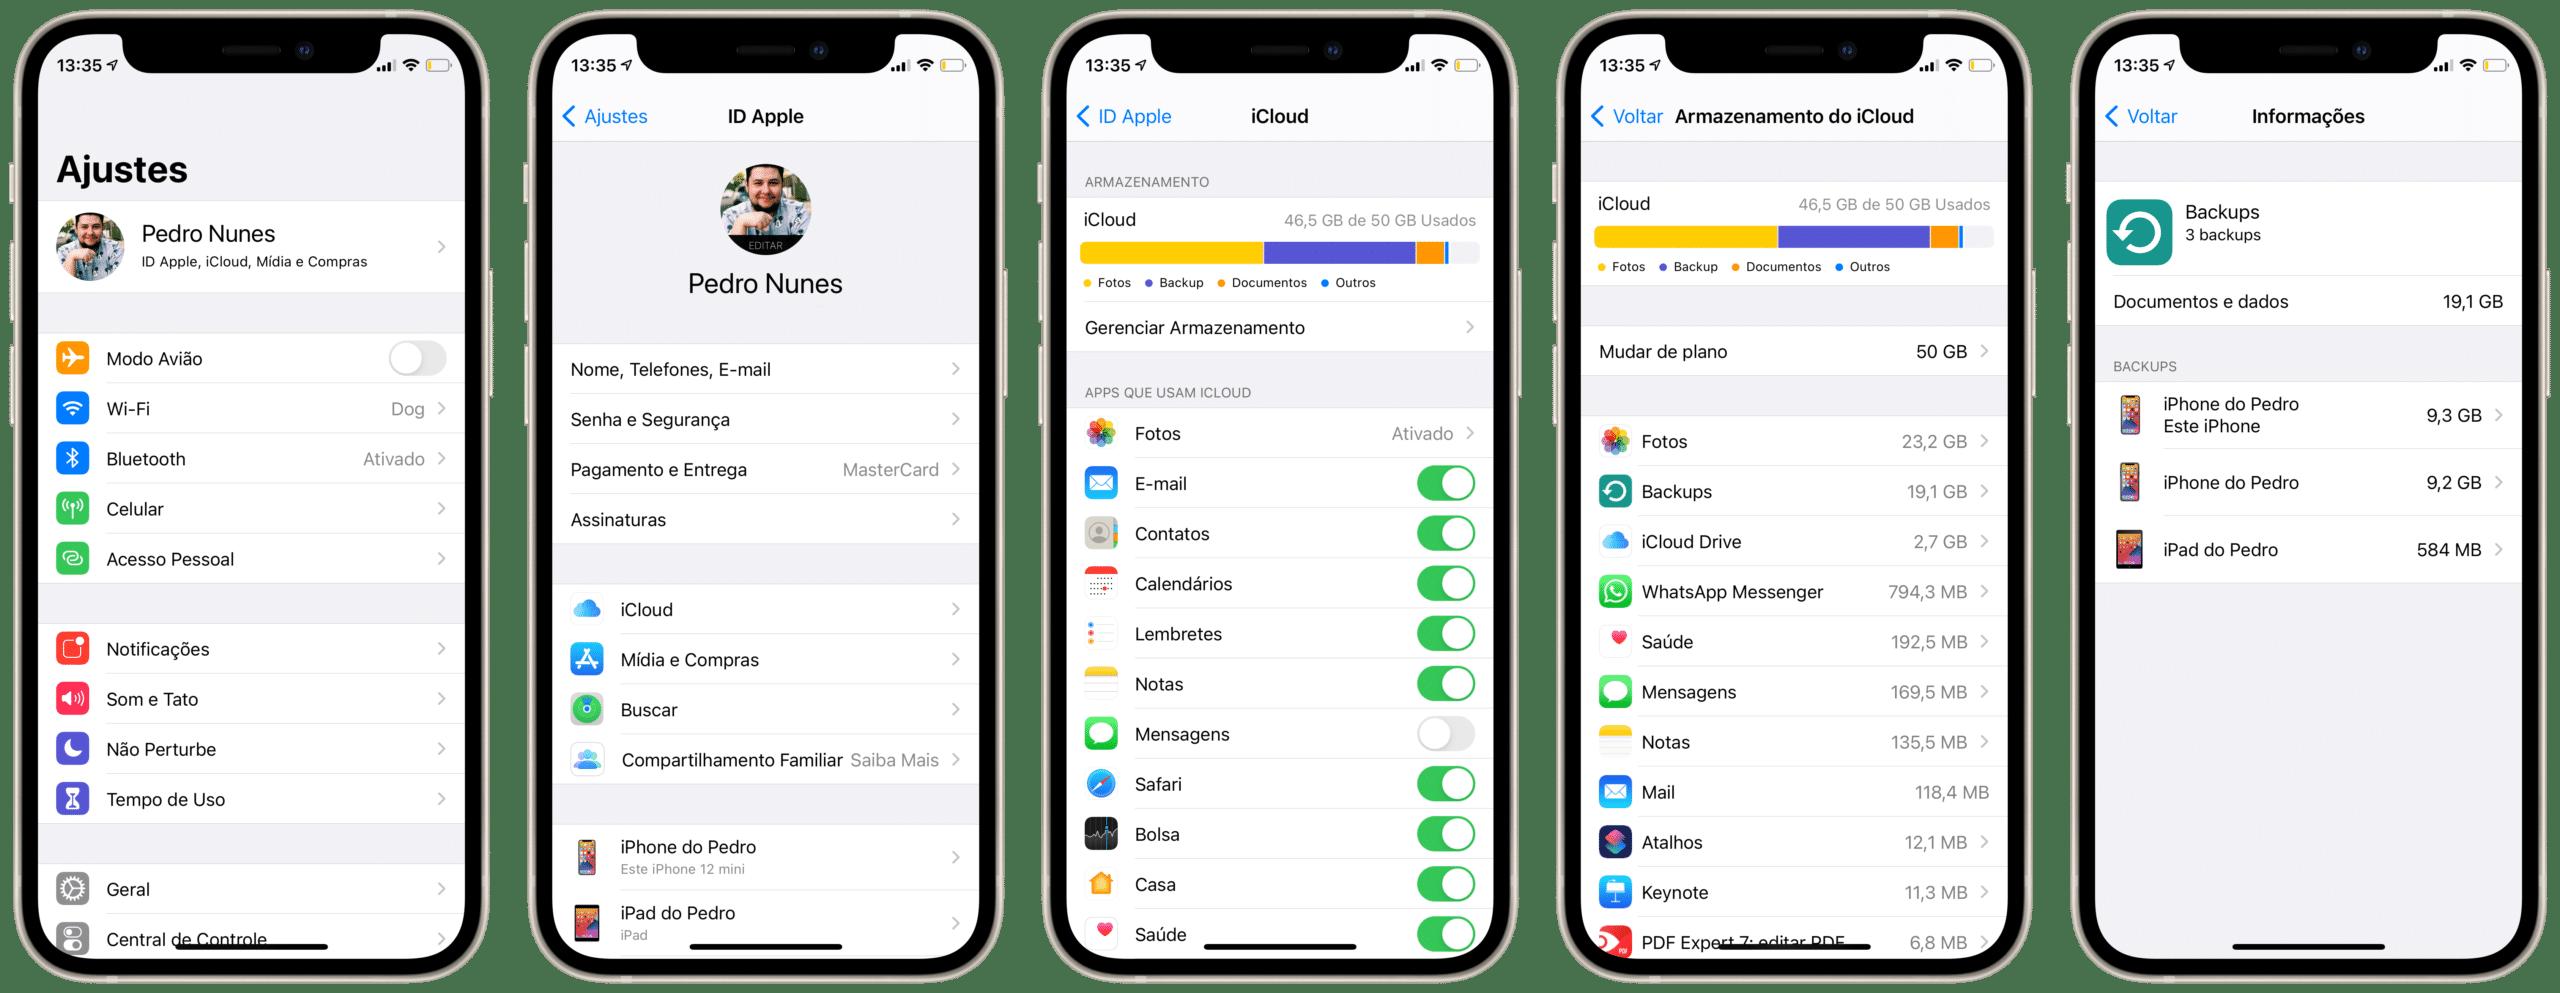 Apagando backups do iCloud no iPhone